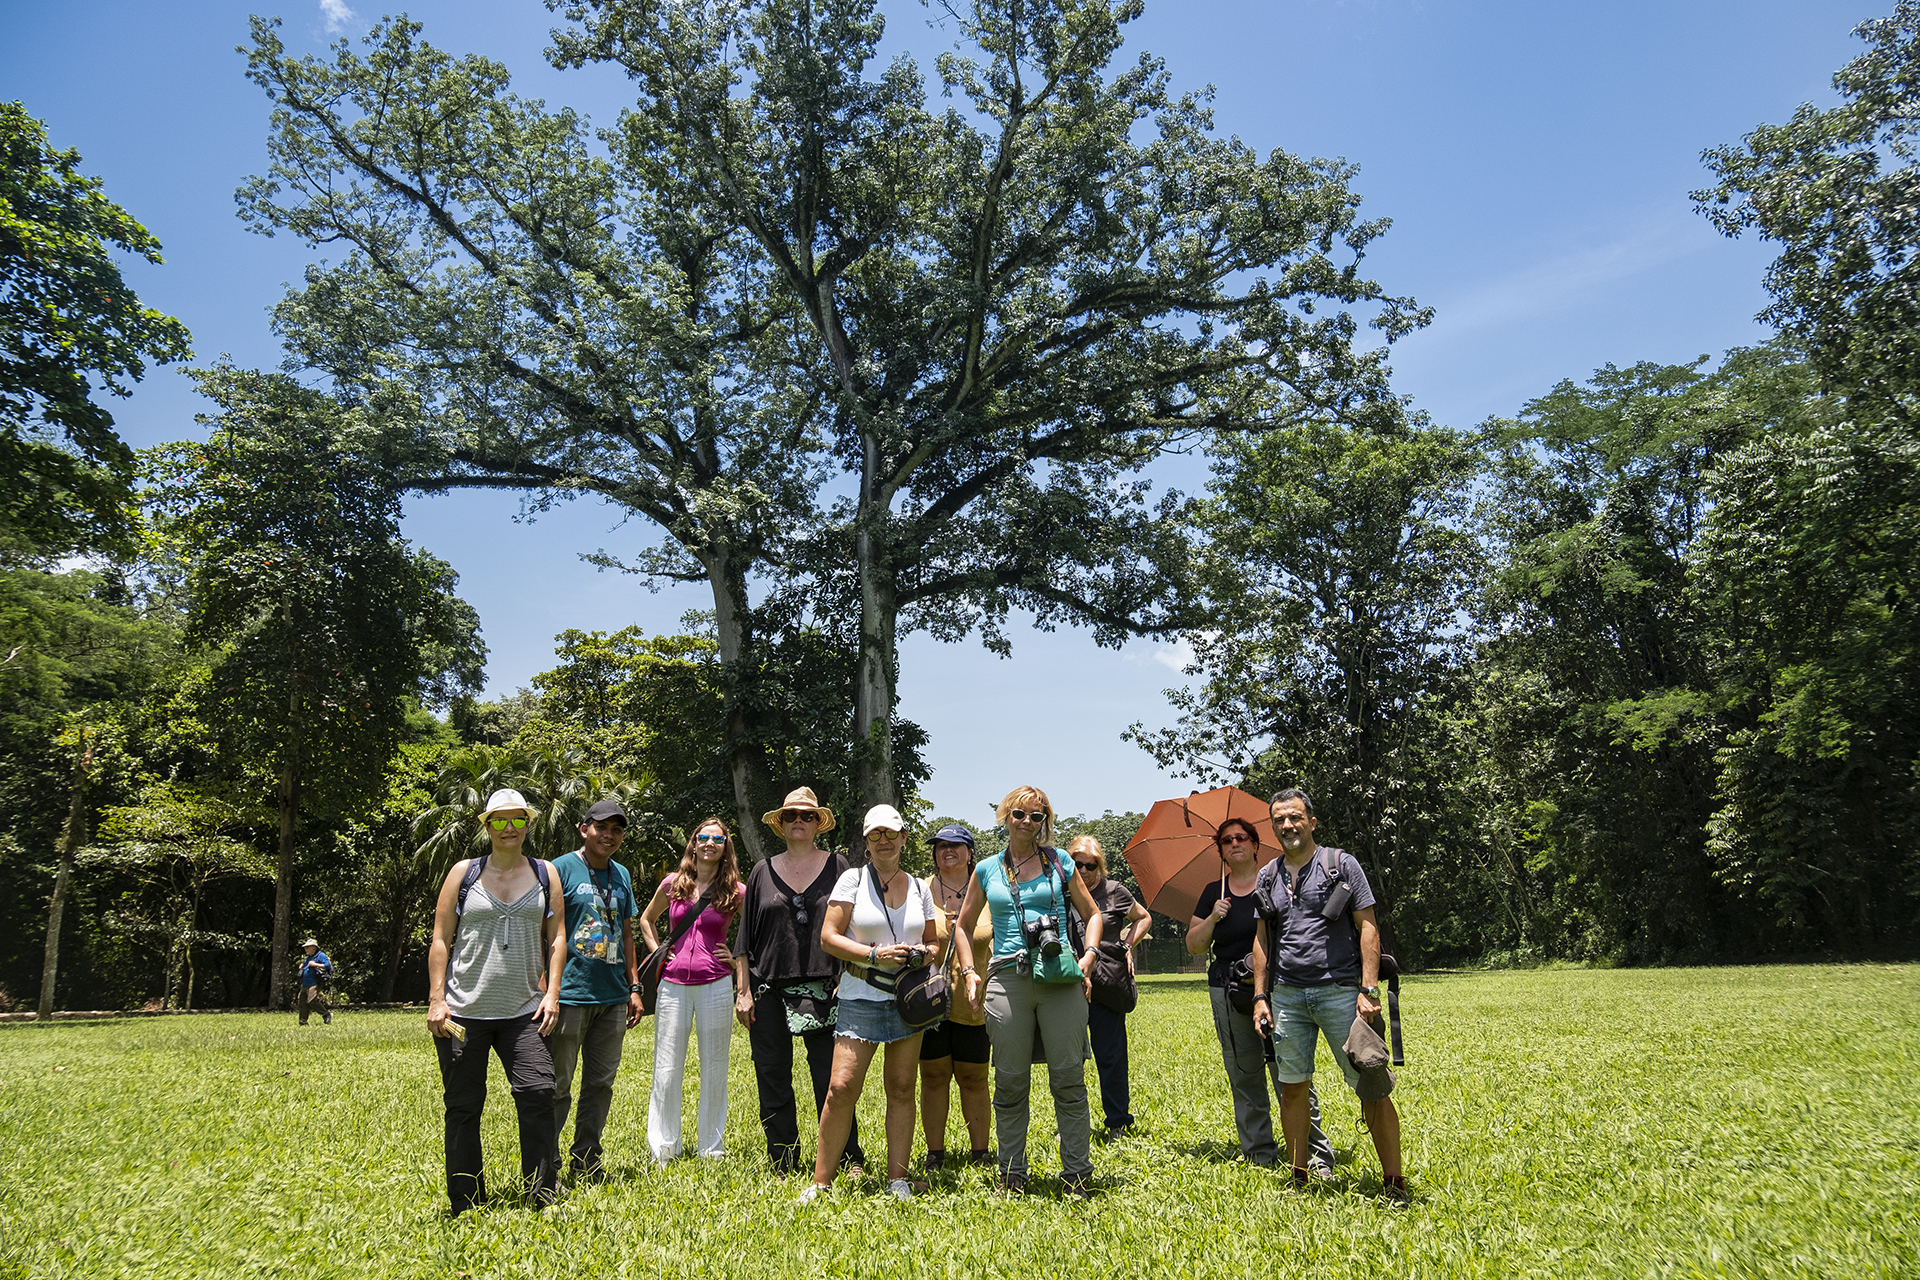 Viajeros del viaje fotográfico a Guatemala posando